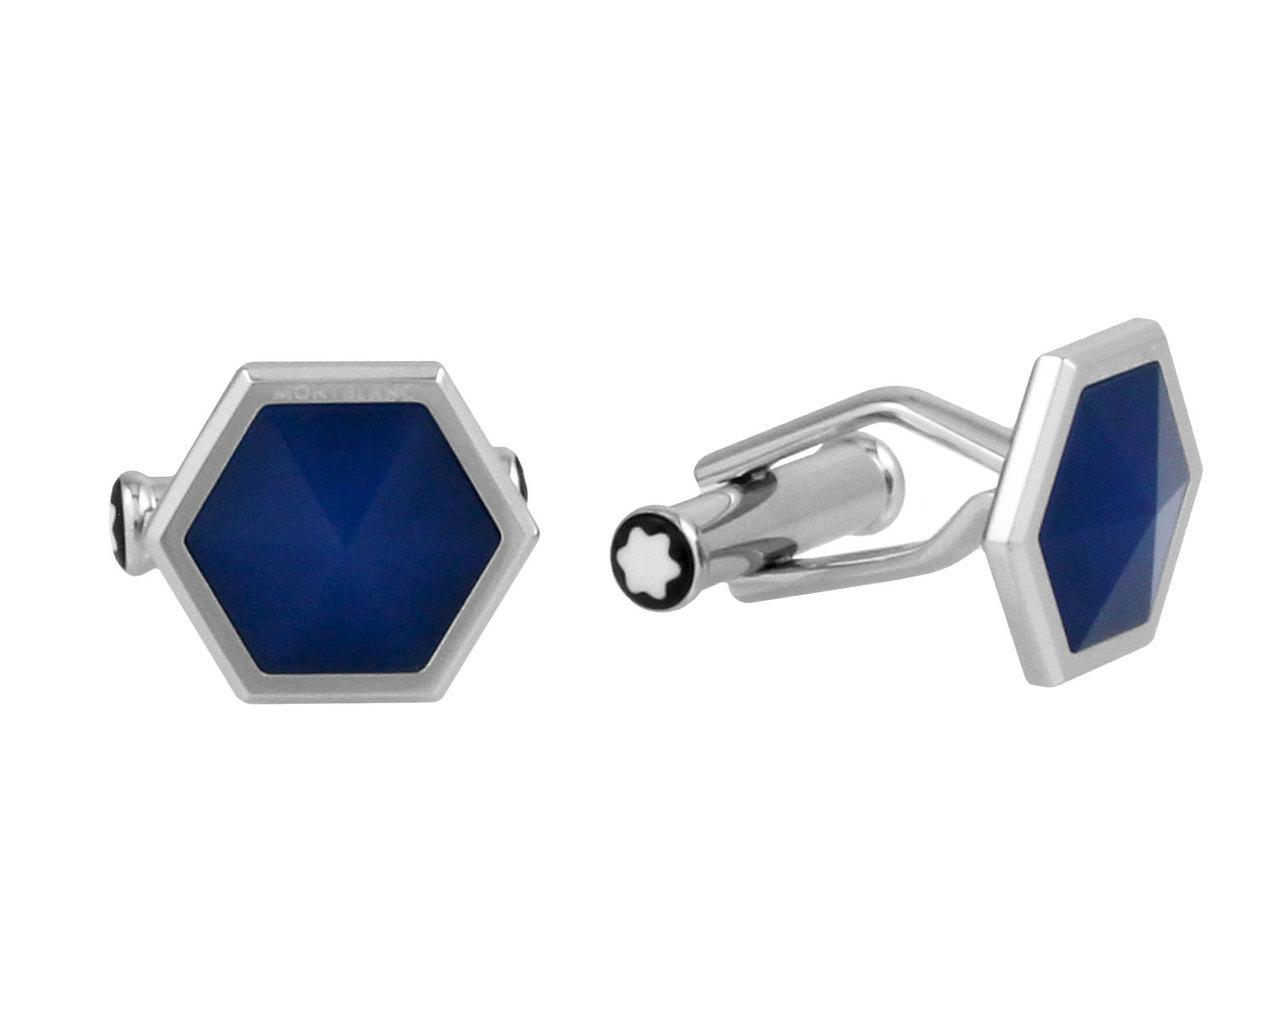 Montblanc Sartorial Blue Onyx Hexagonal Cufflinks